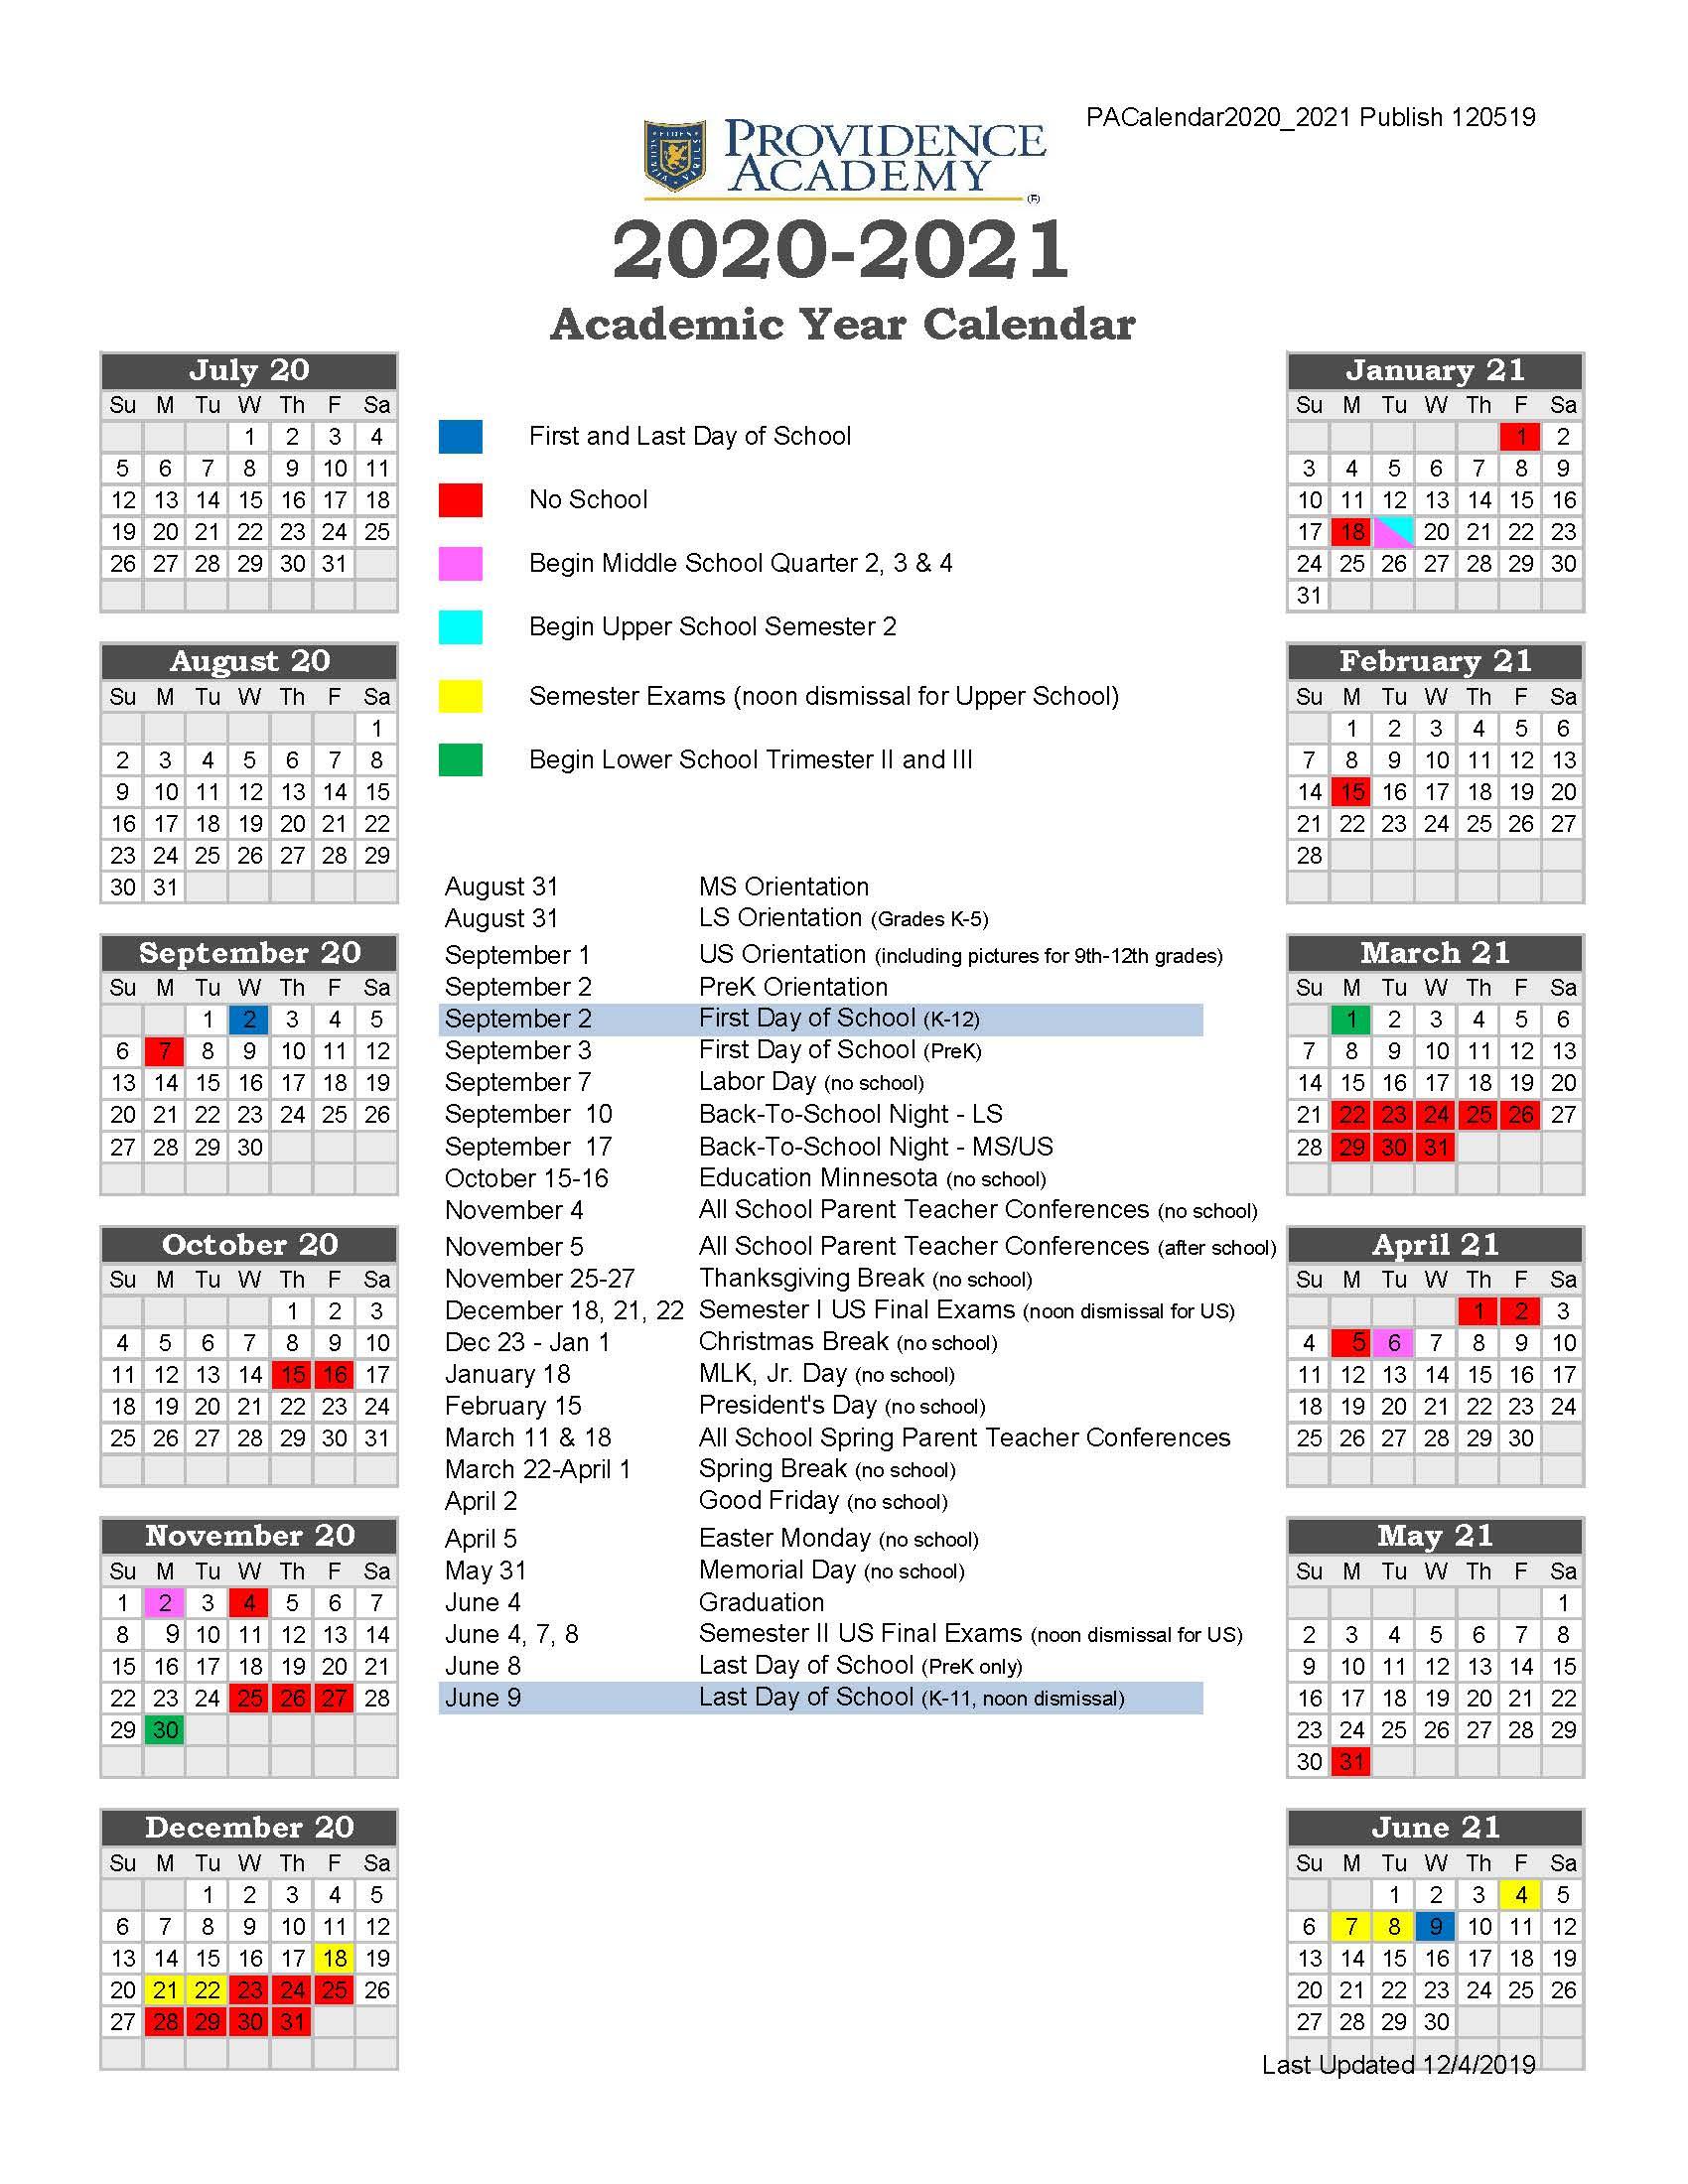 Academic Calendar - Providence Academy in University Of Minnesota2020-2021 Academic Calendar